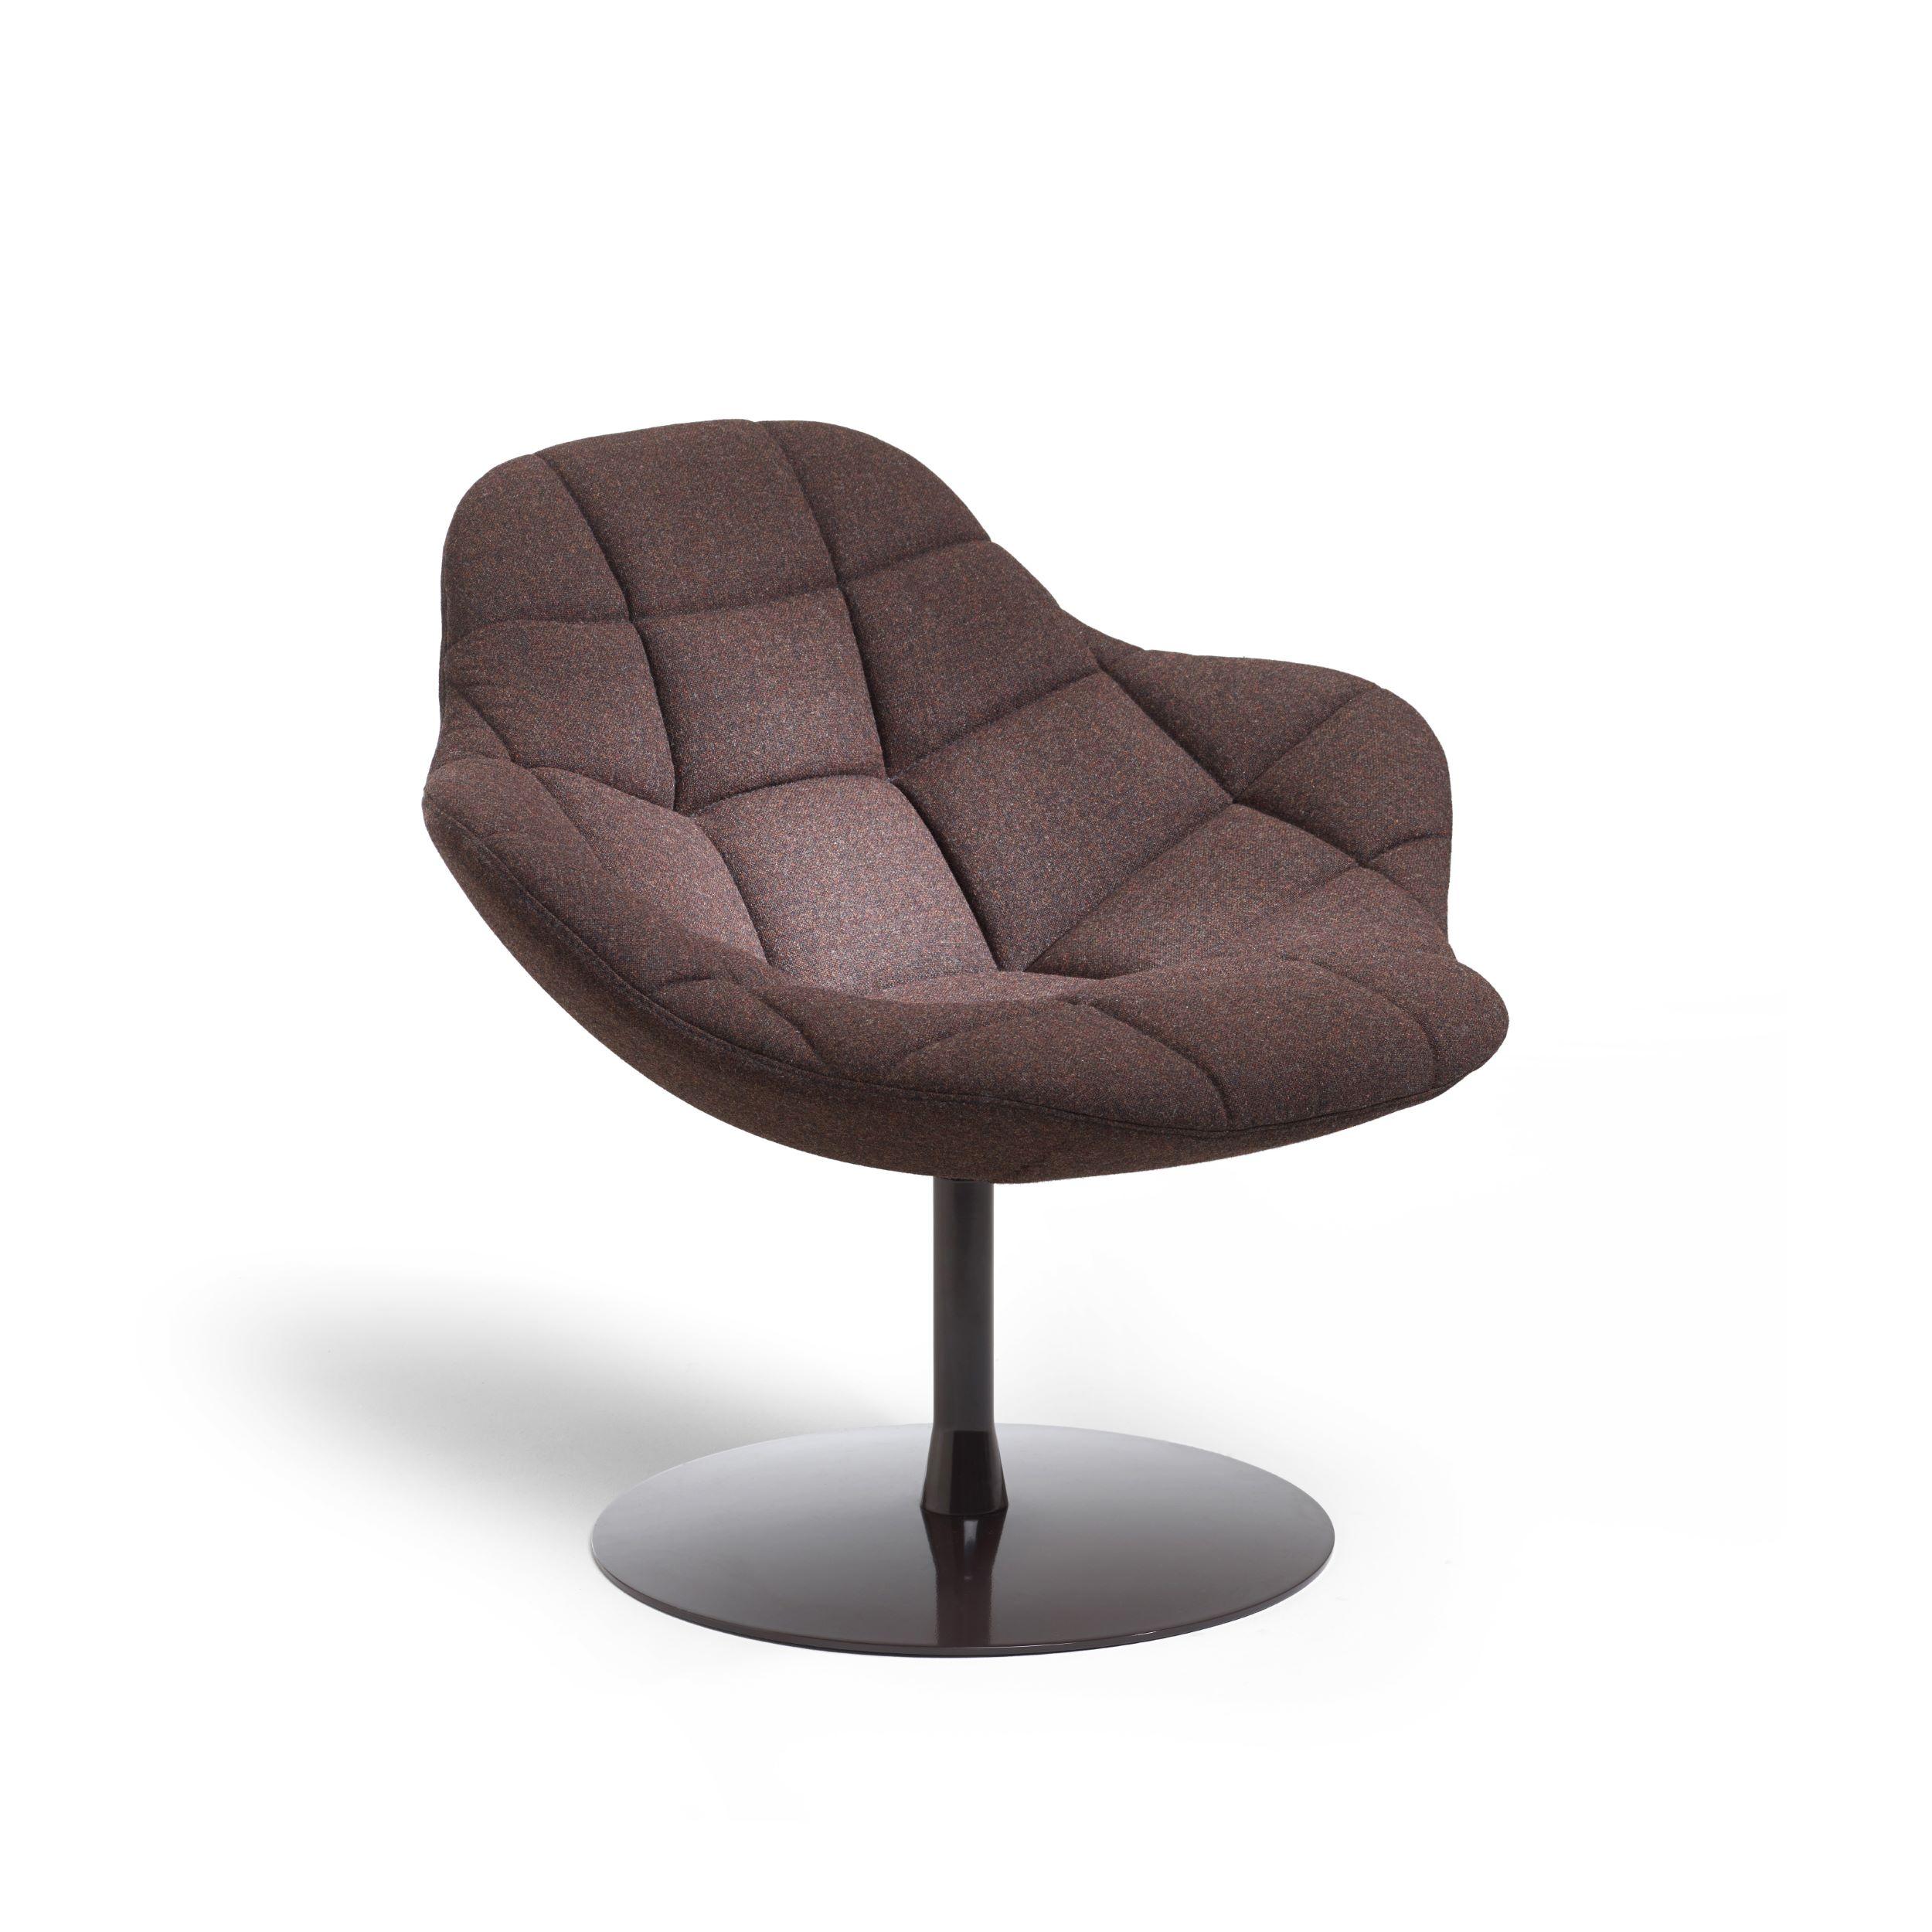 Palma easy chair wooden frame design by khodi feiz for Easy chair designs